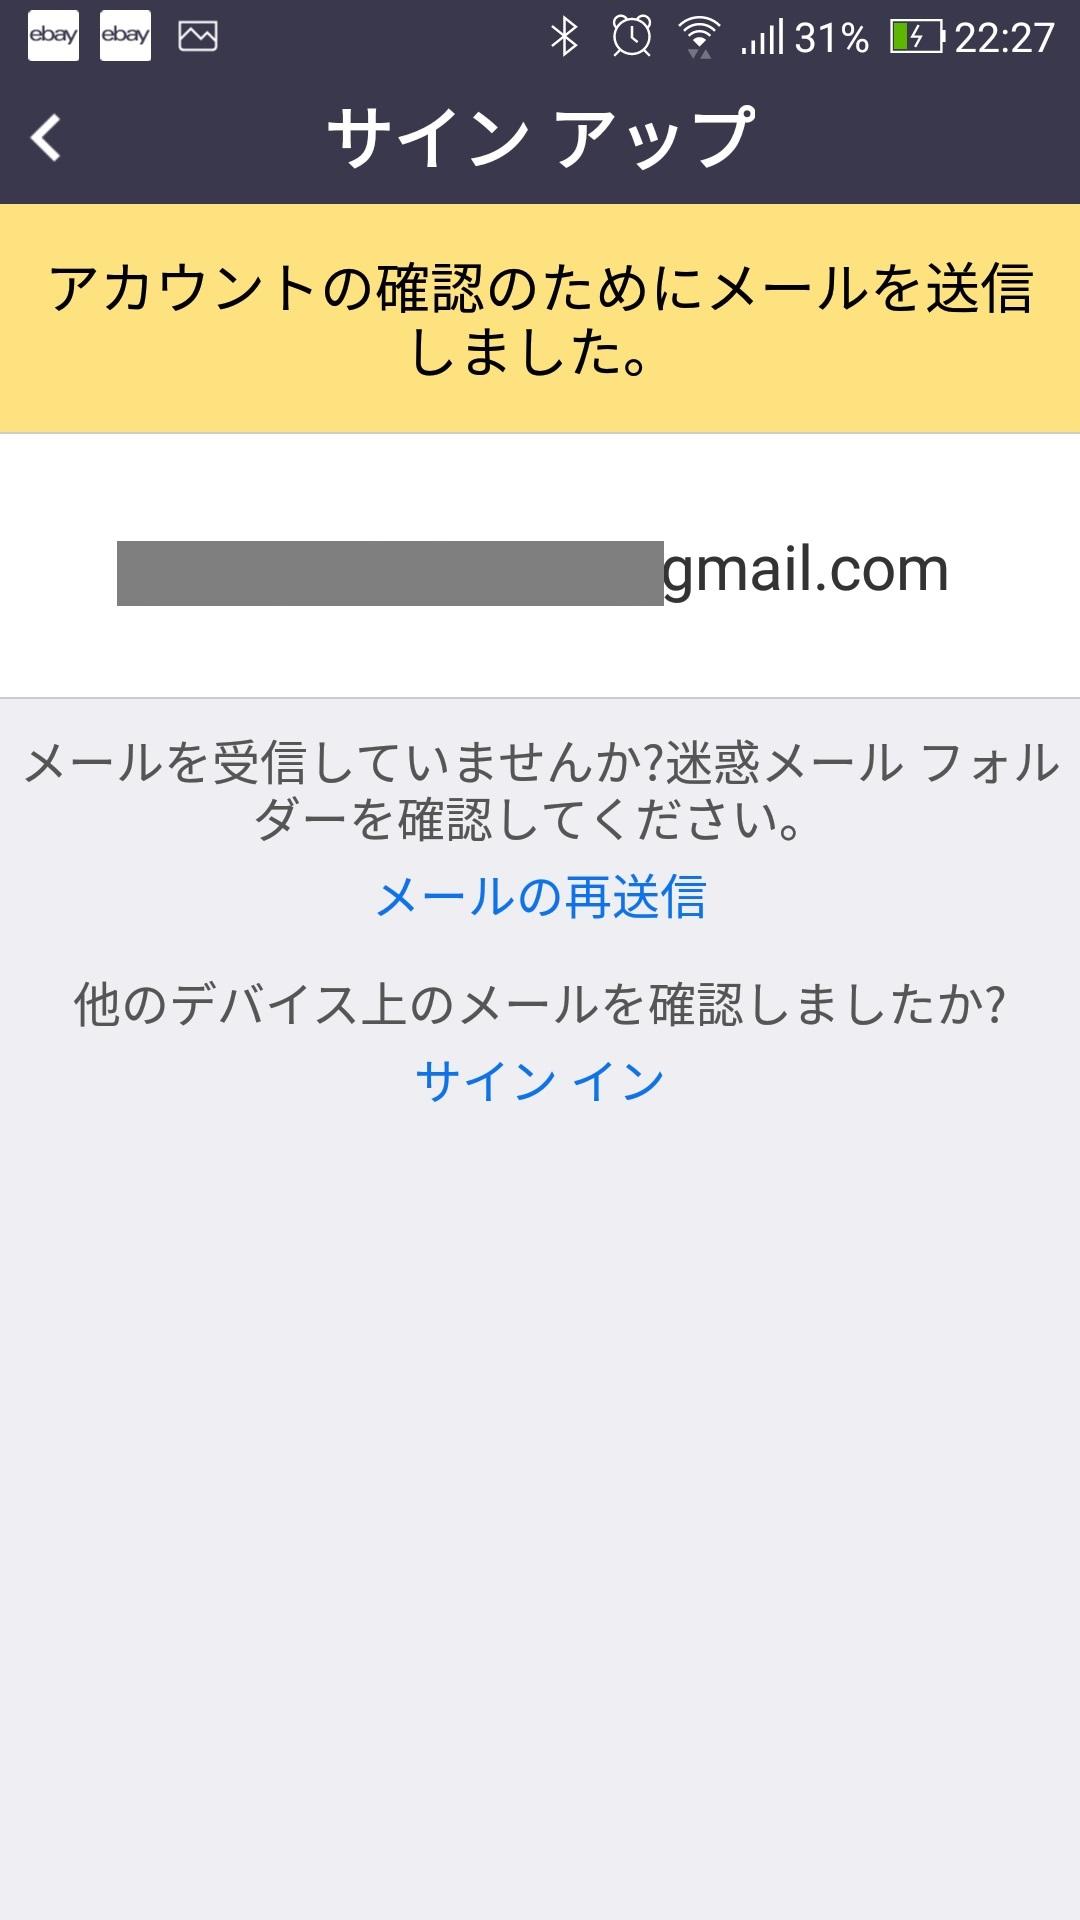 Screenshot 20200416 222800 - Zoomの使い方~一人で総合セルフチェック(パソコンとスマホを使って自分で)